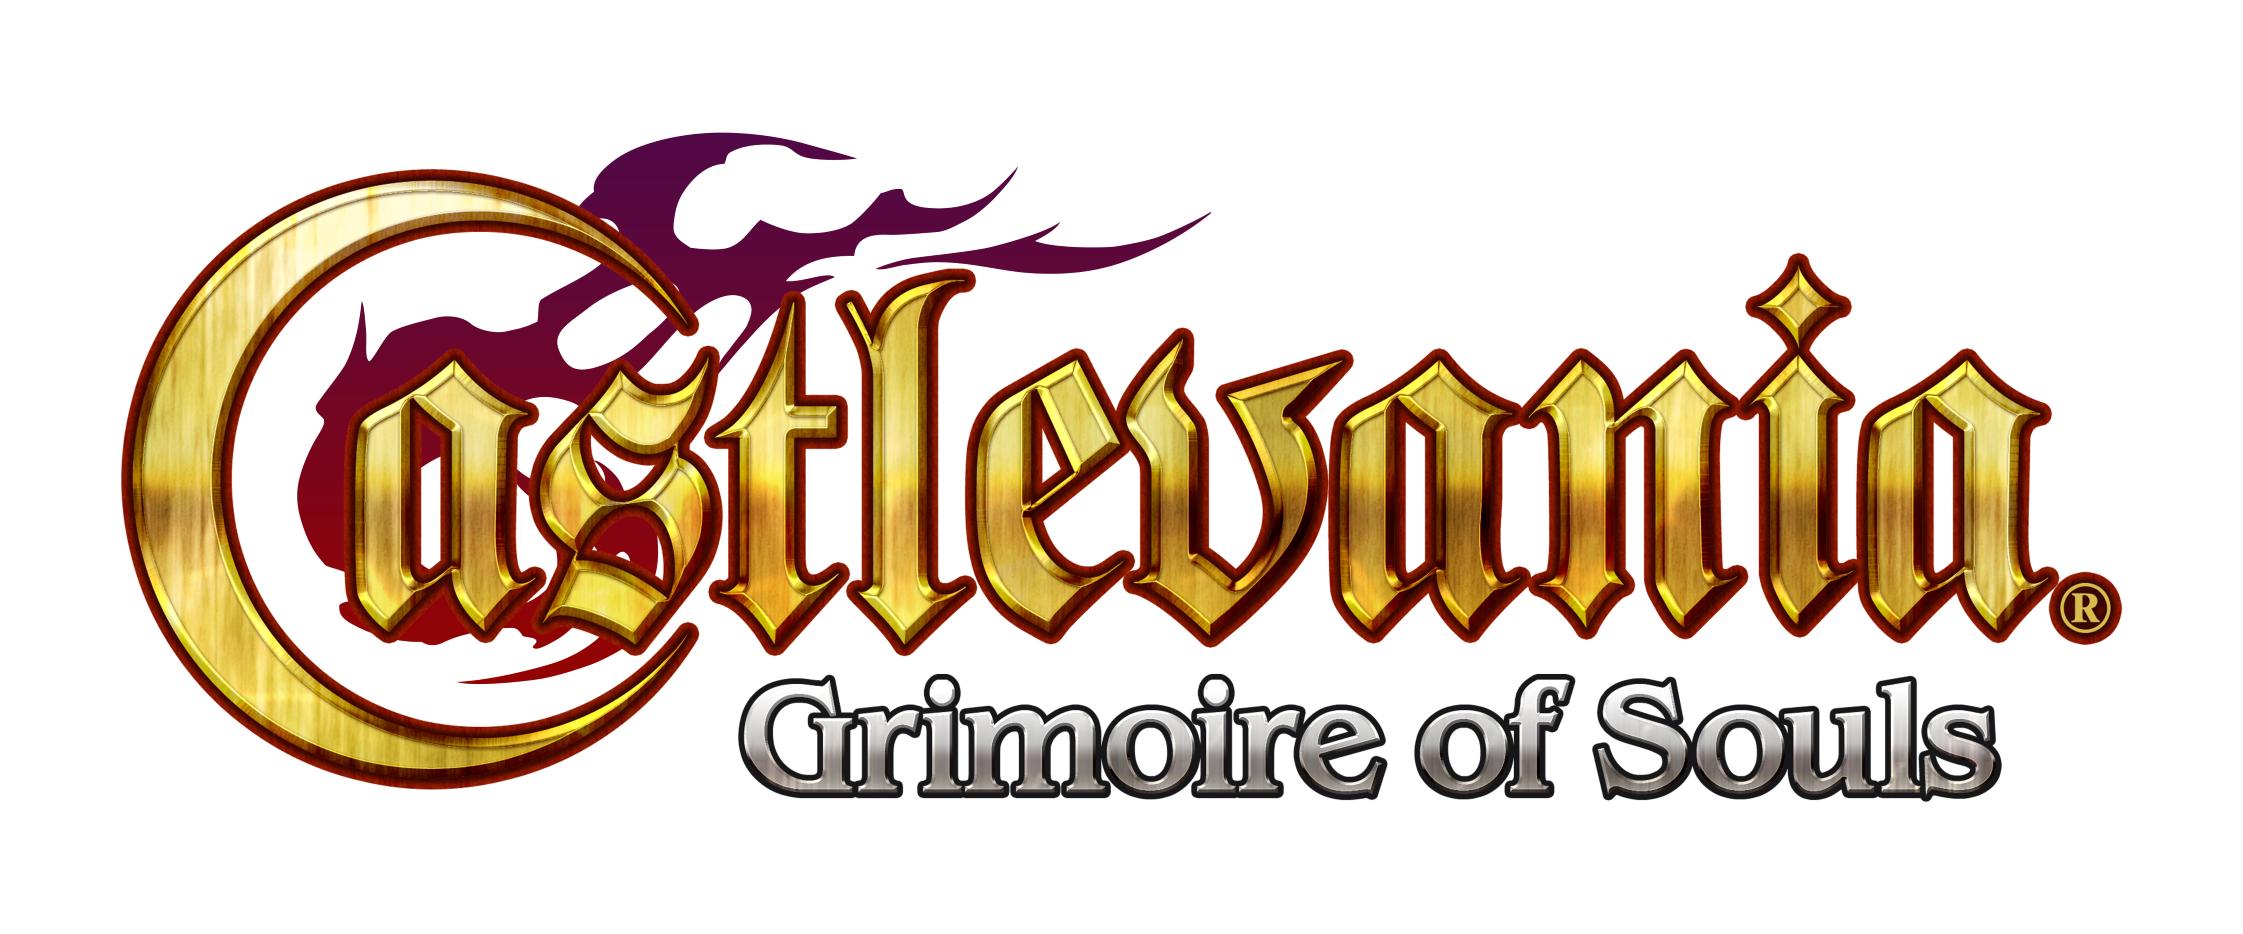 Castlevania: Grimoire Of Souls arriva l'Halloween update